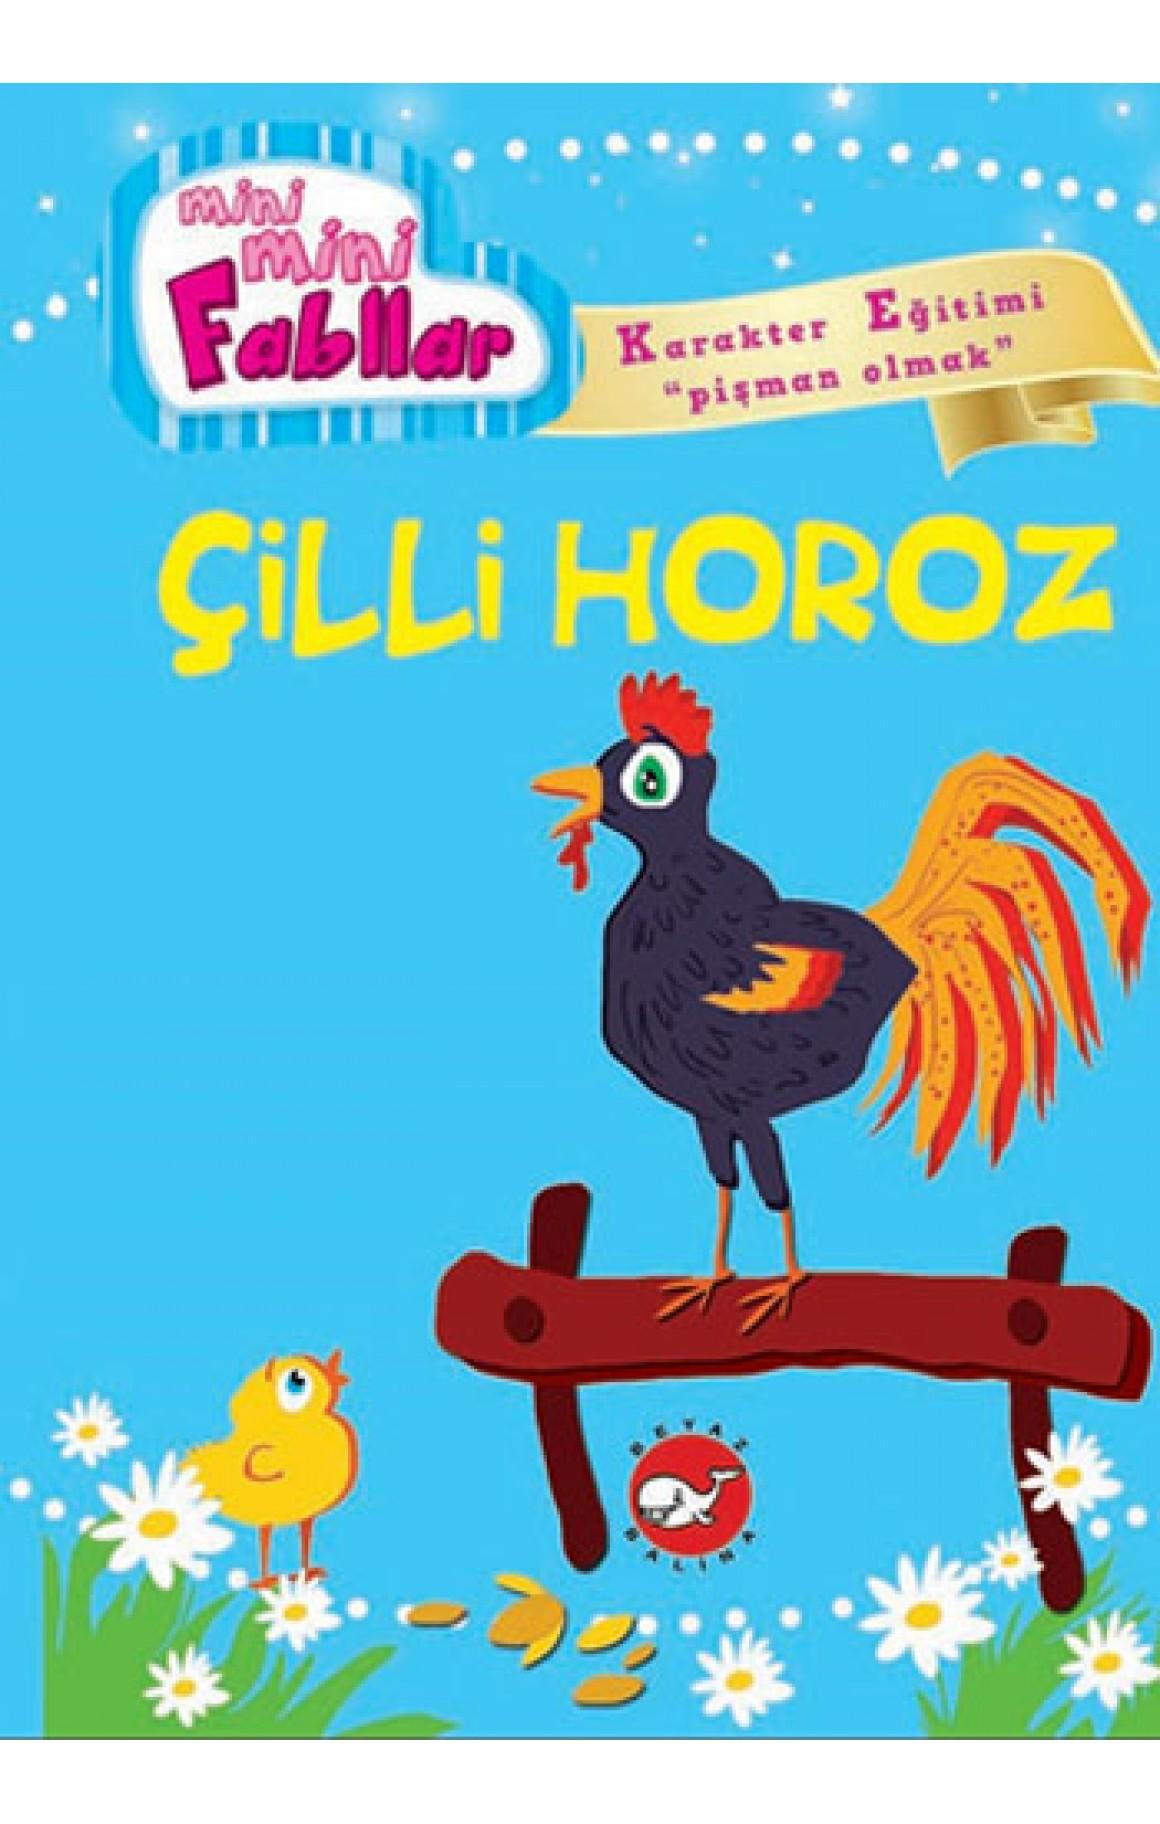 Çilli Horoz - Mini Mini Fabllar